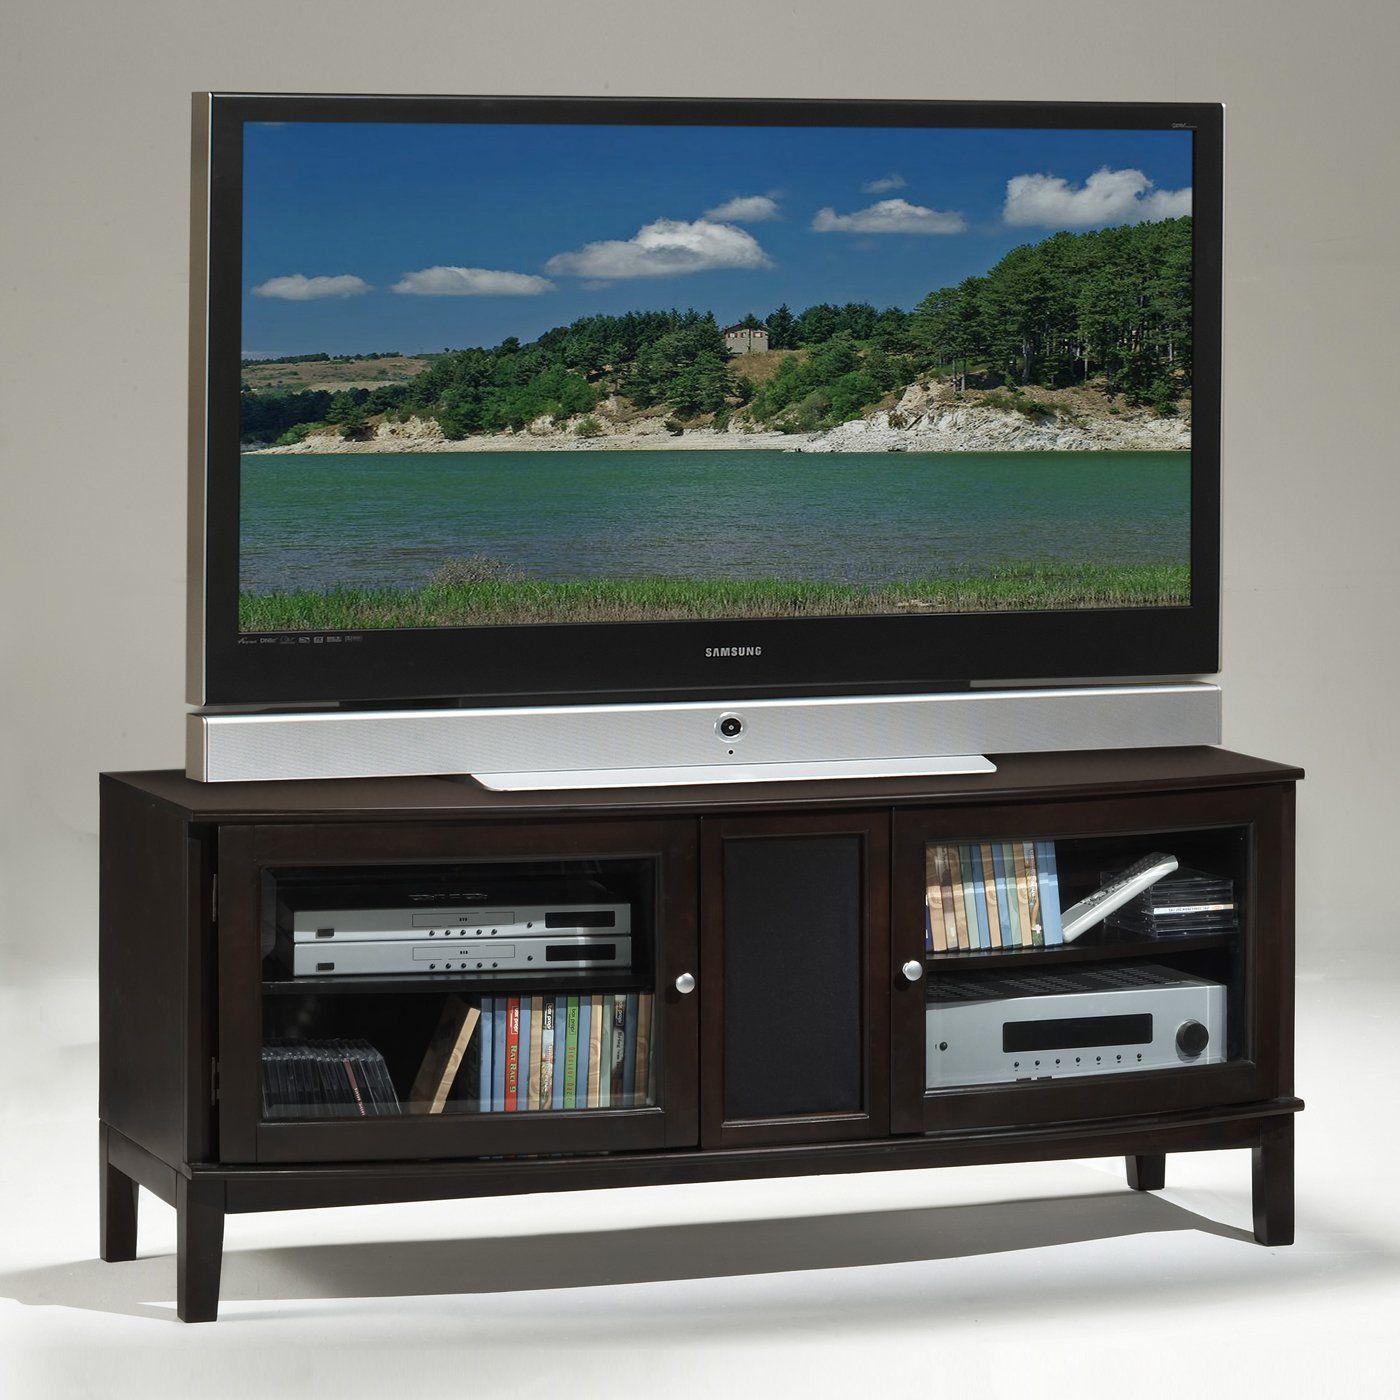 Whalen Furniture Mfg Exr Tv60 E Excalibur 60 In Tv Stand Tv Stand Whalen Furniture 60 Tv Stand